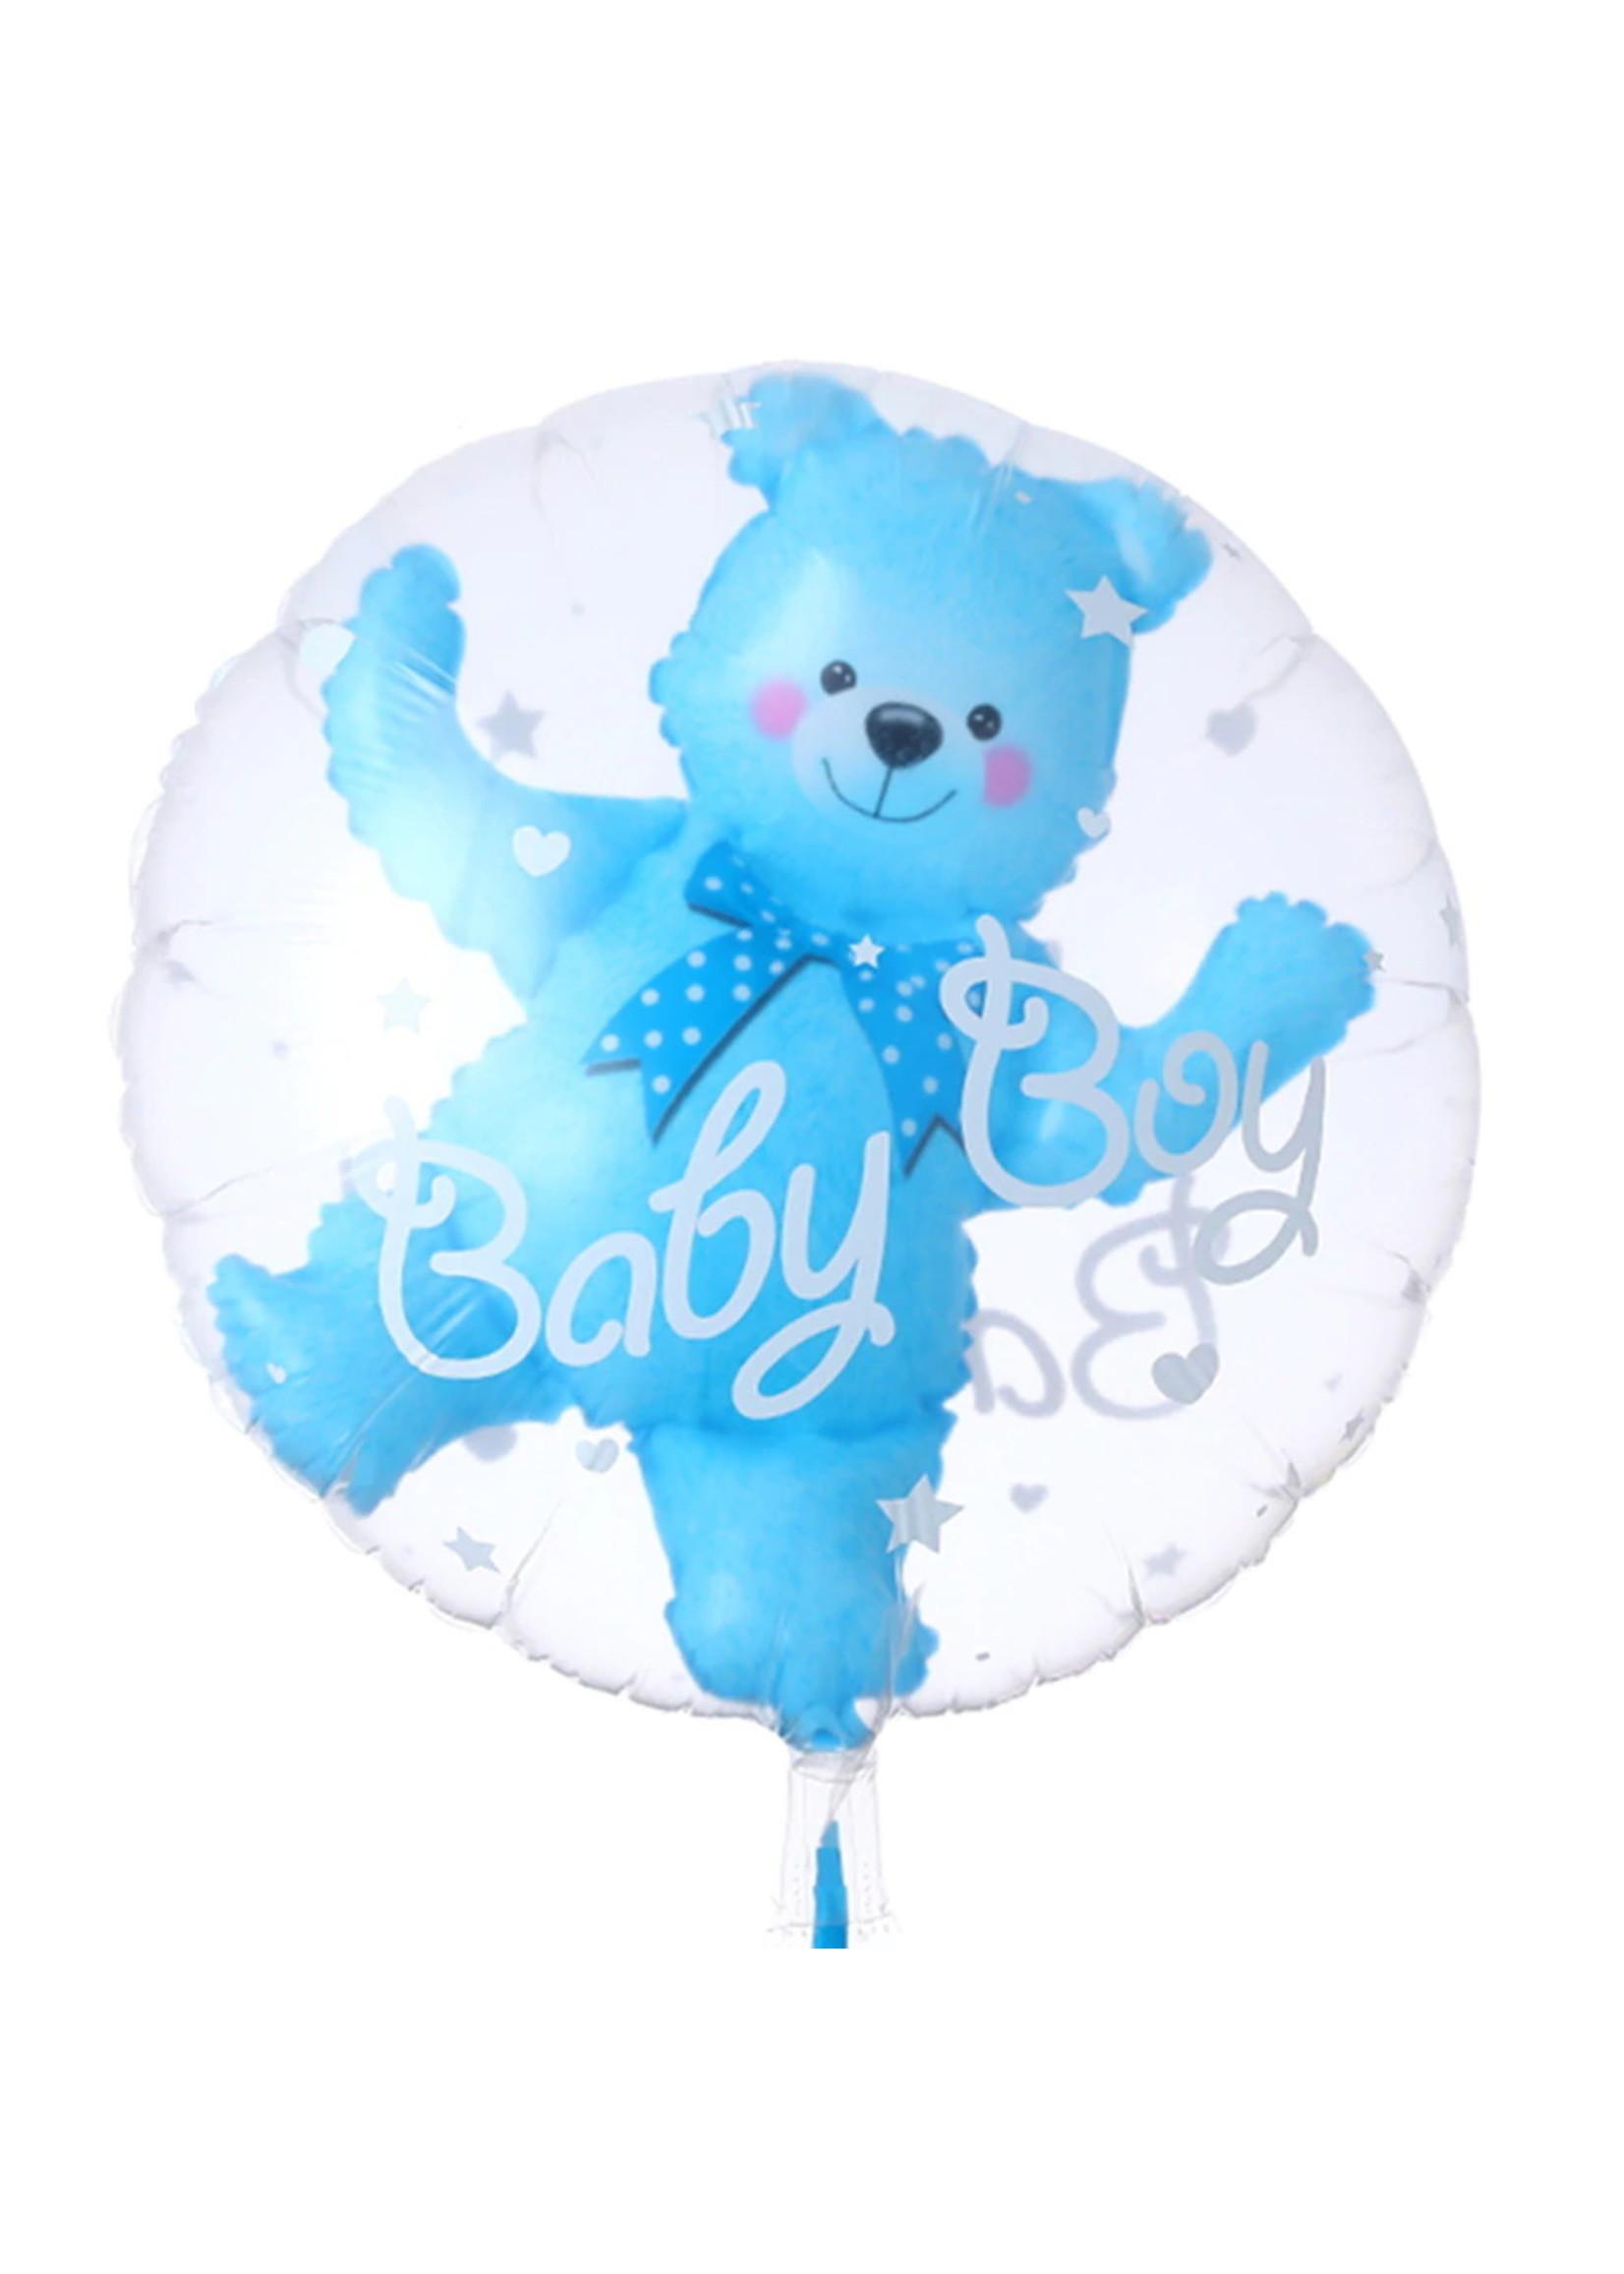 Annienas ballon It's a...